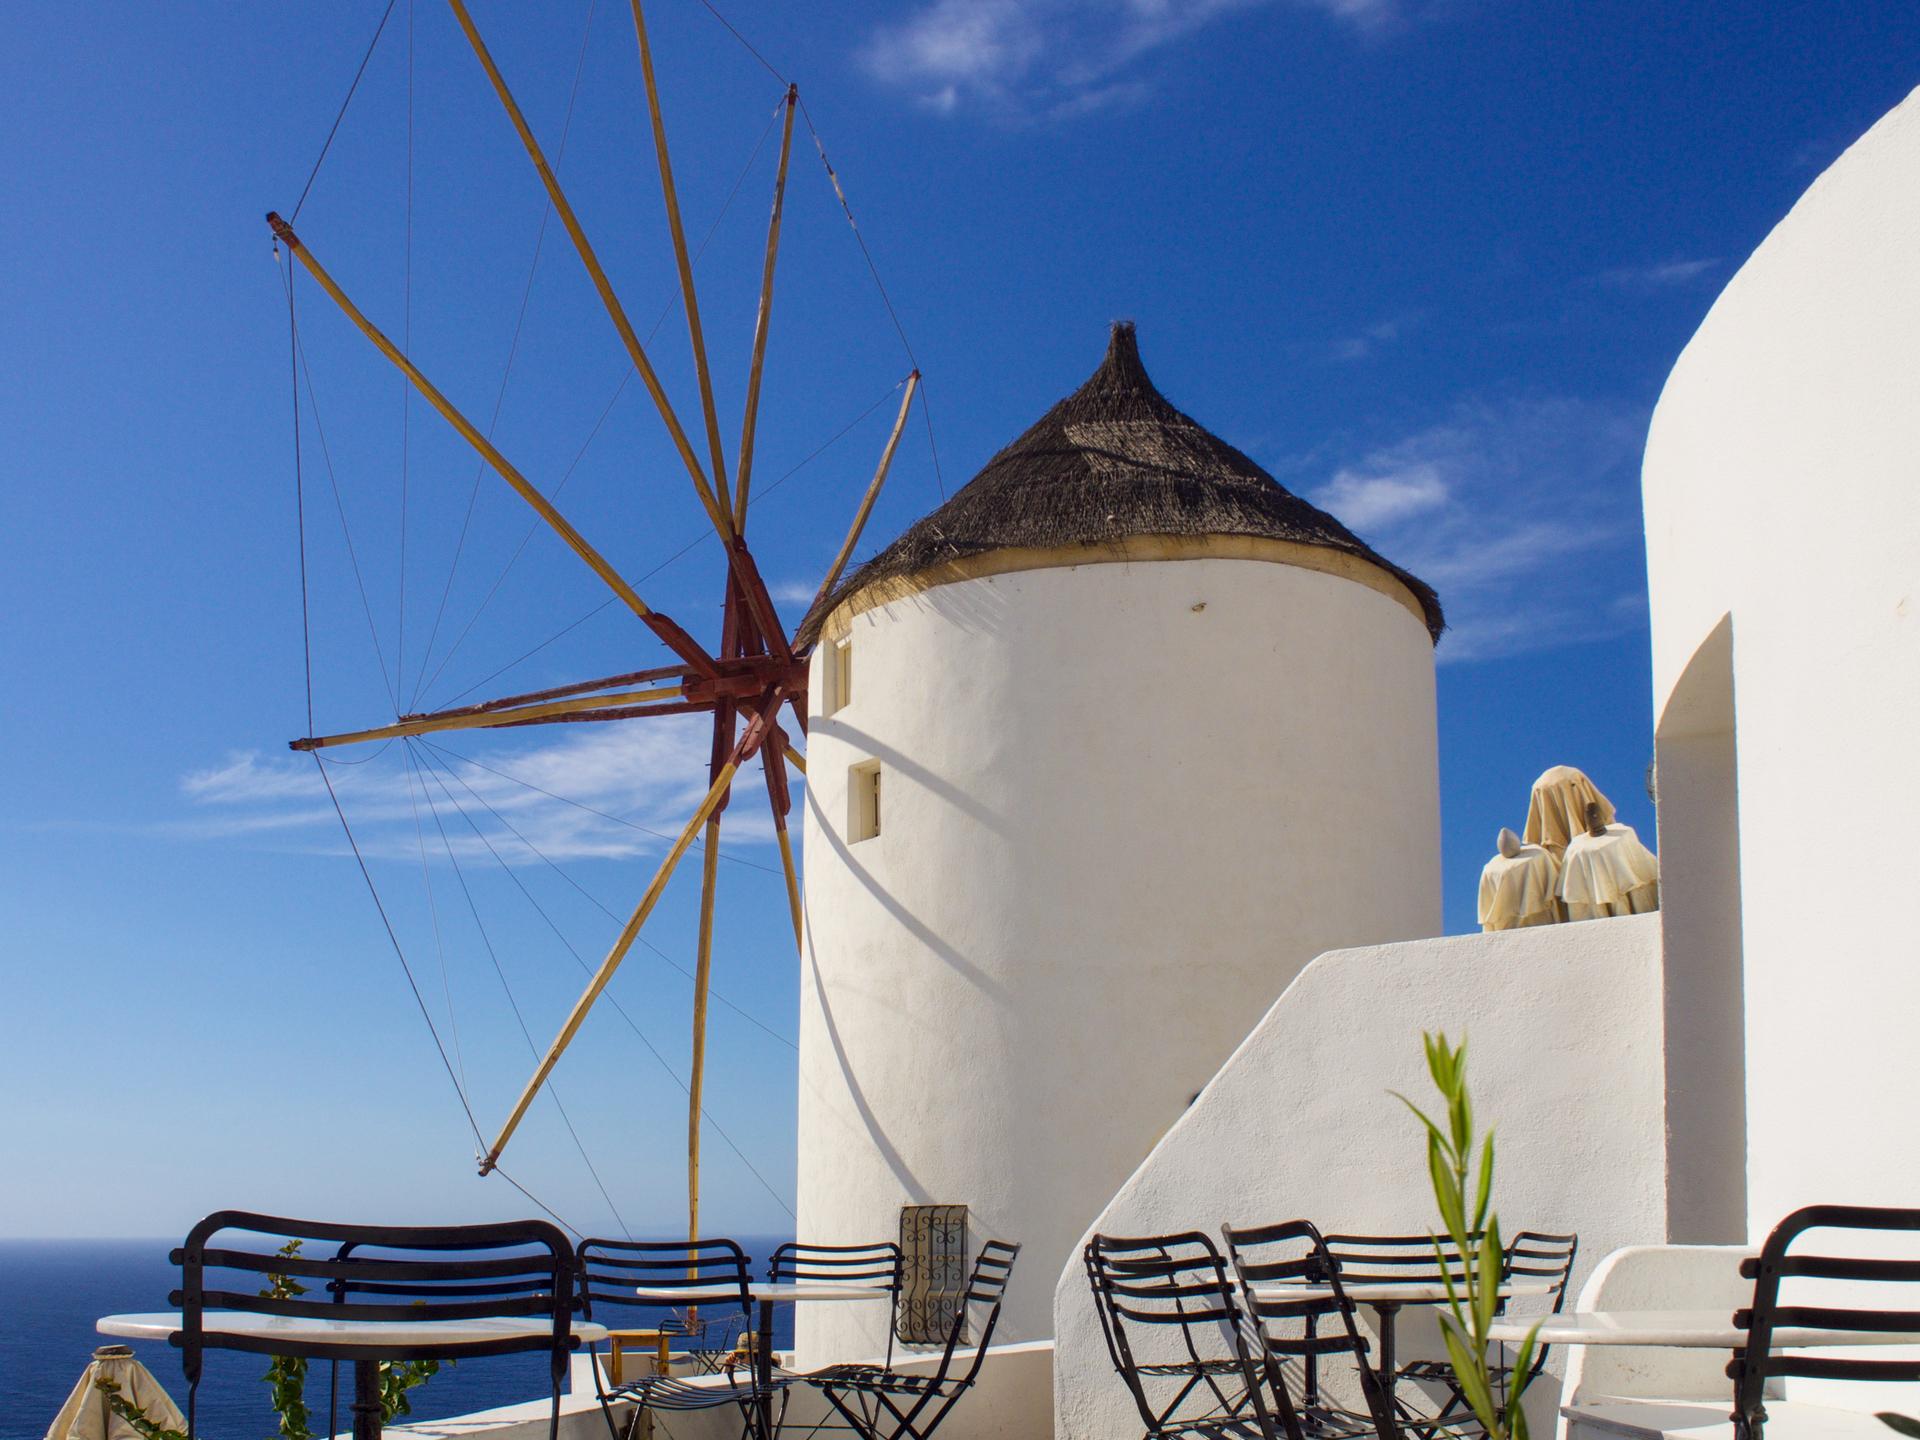 Windmill on Santorini.    wind, travel, traditional, summer